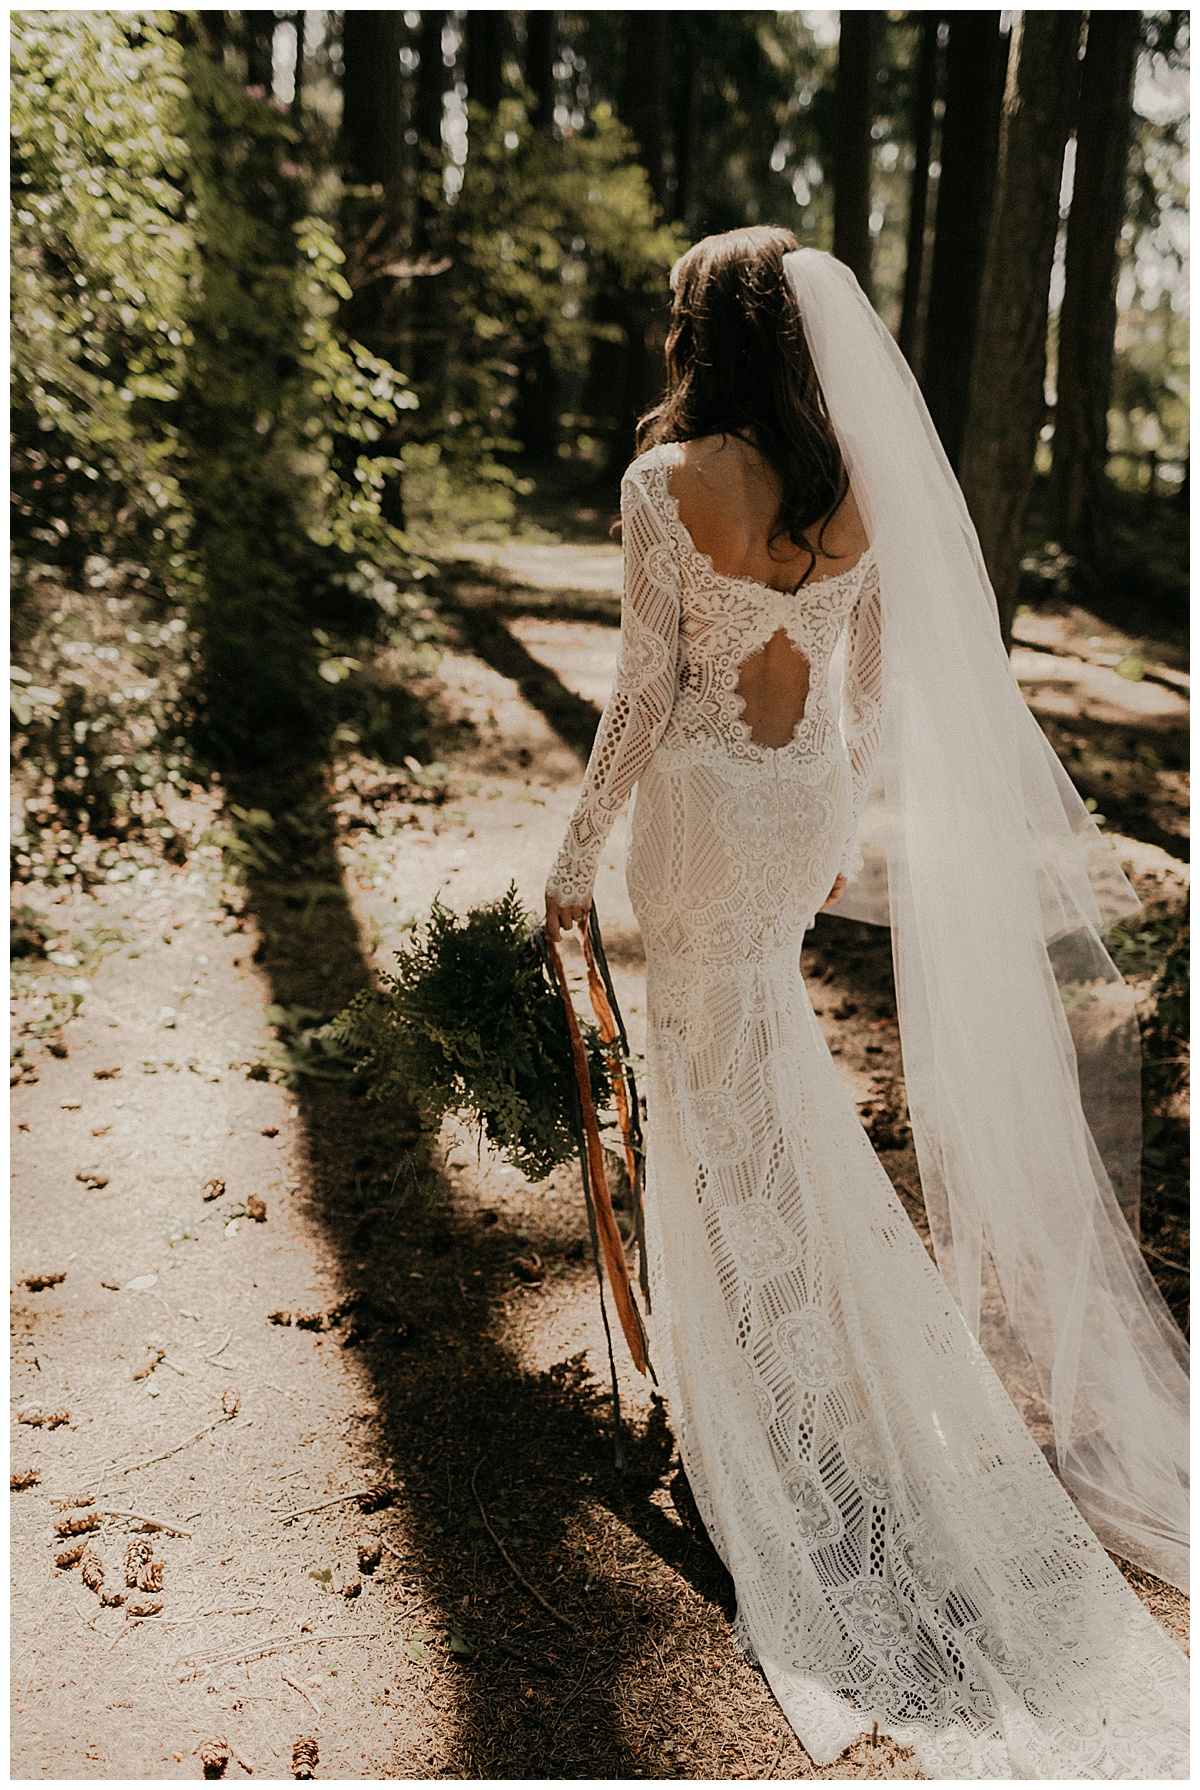 Bixby-+-Pine-Samantha-McFarlen-Kitsap-Memorial-State-Park-_0021.jpg